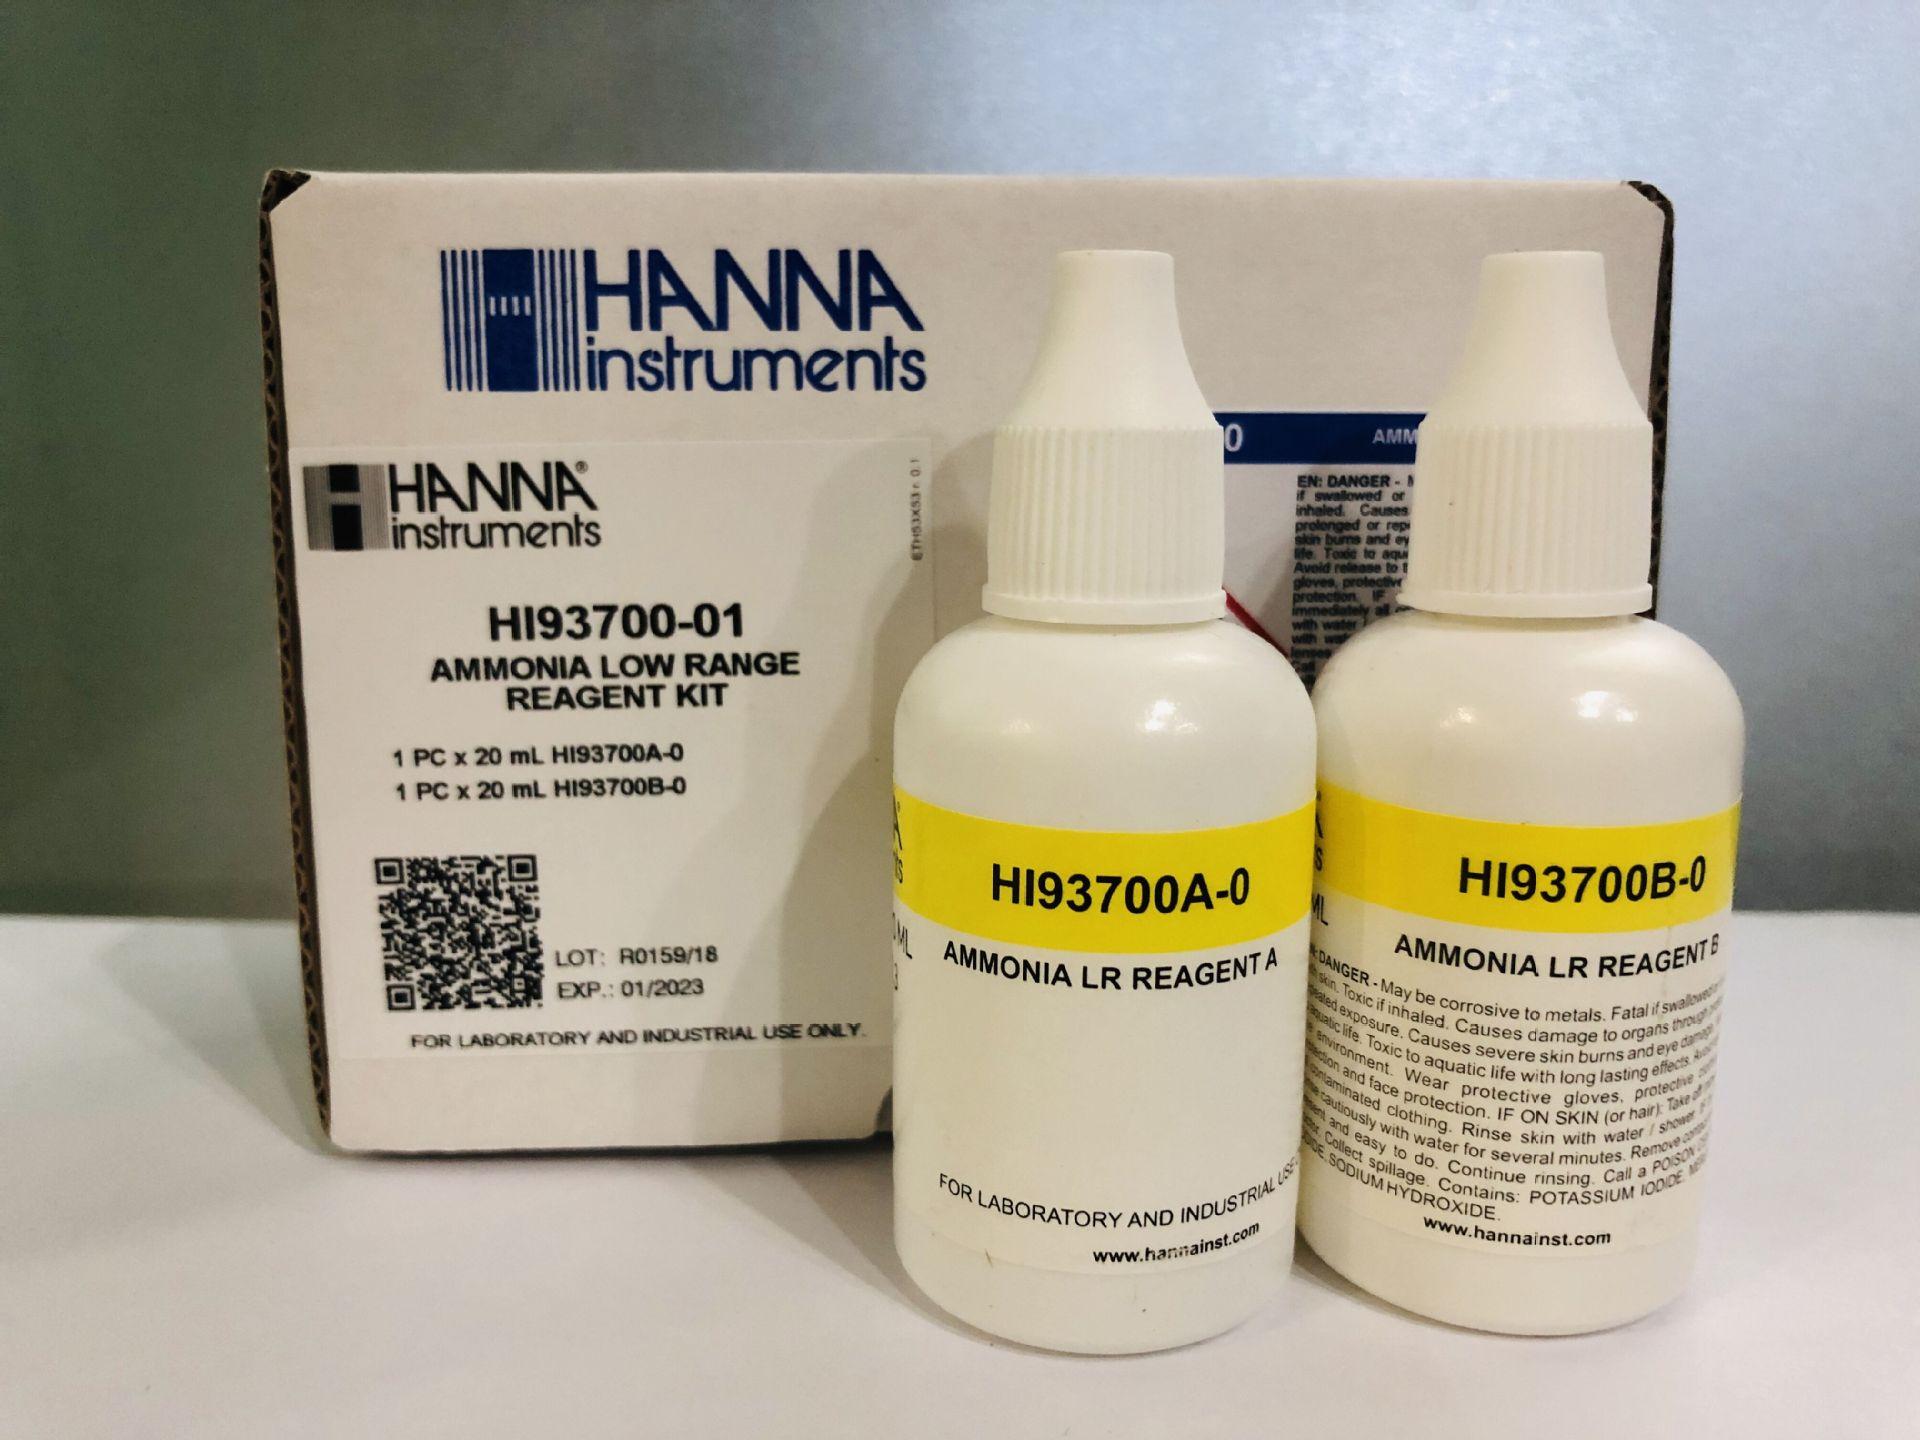 HI93700-01